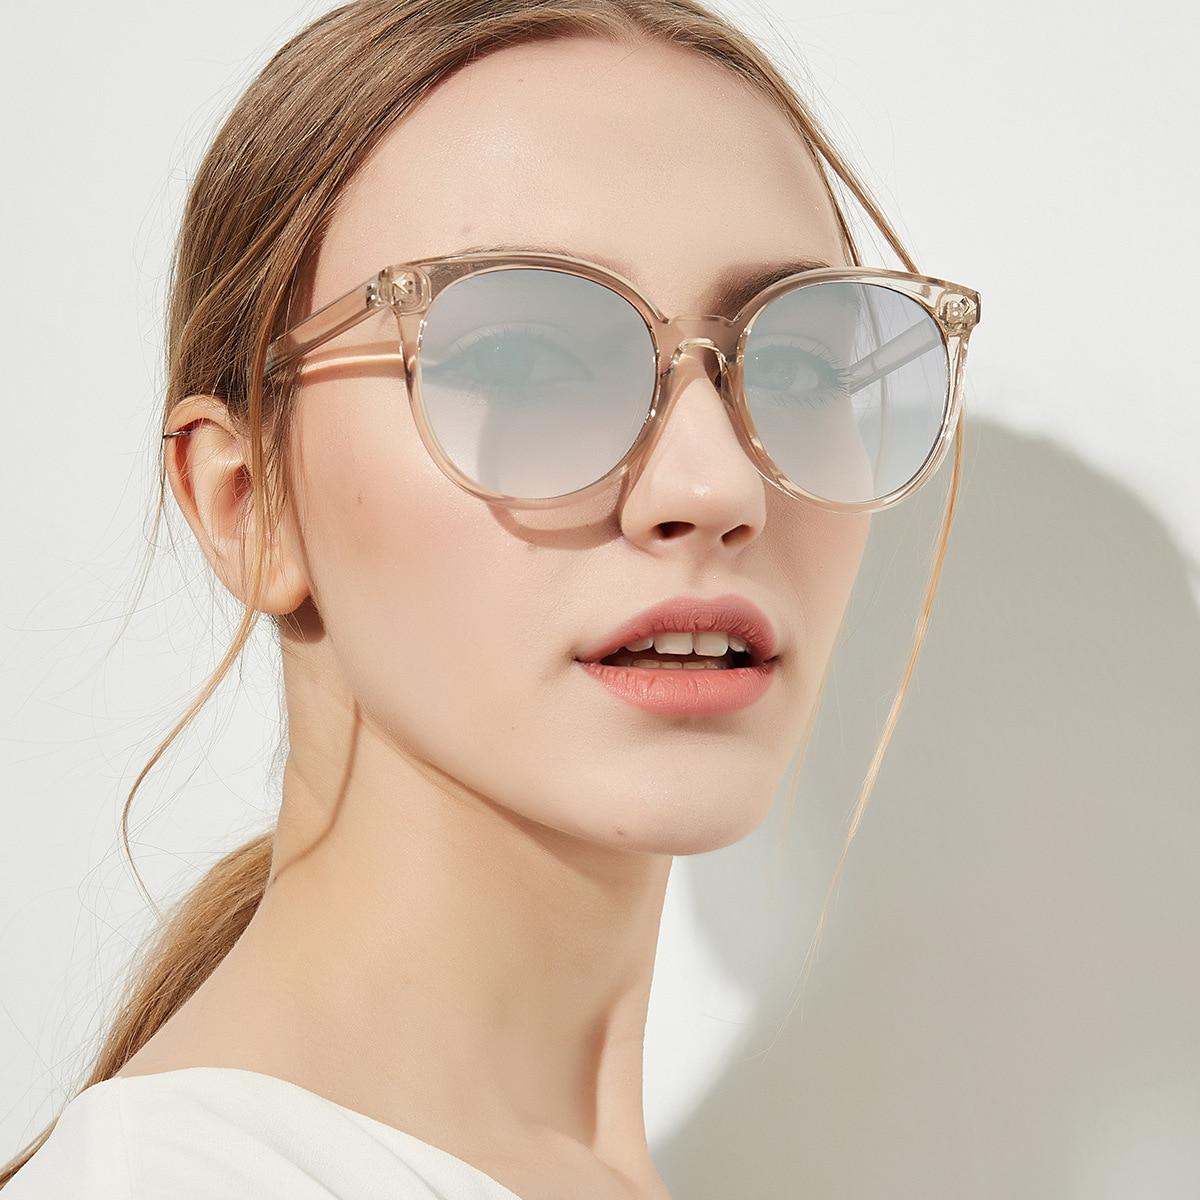 YOOSKE 90s Round Sunglasses Women Elegant Cat Eyes Sun glasses Ladies Vintage Black Coffee Color Eyewear Shades for Womens UV400